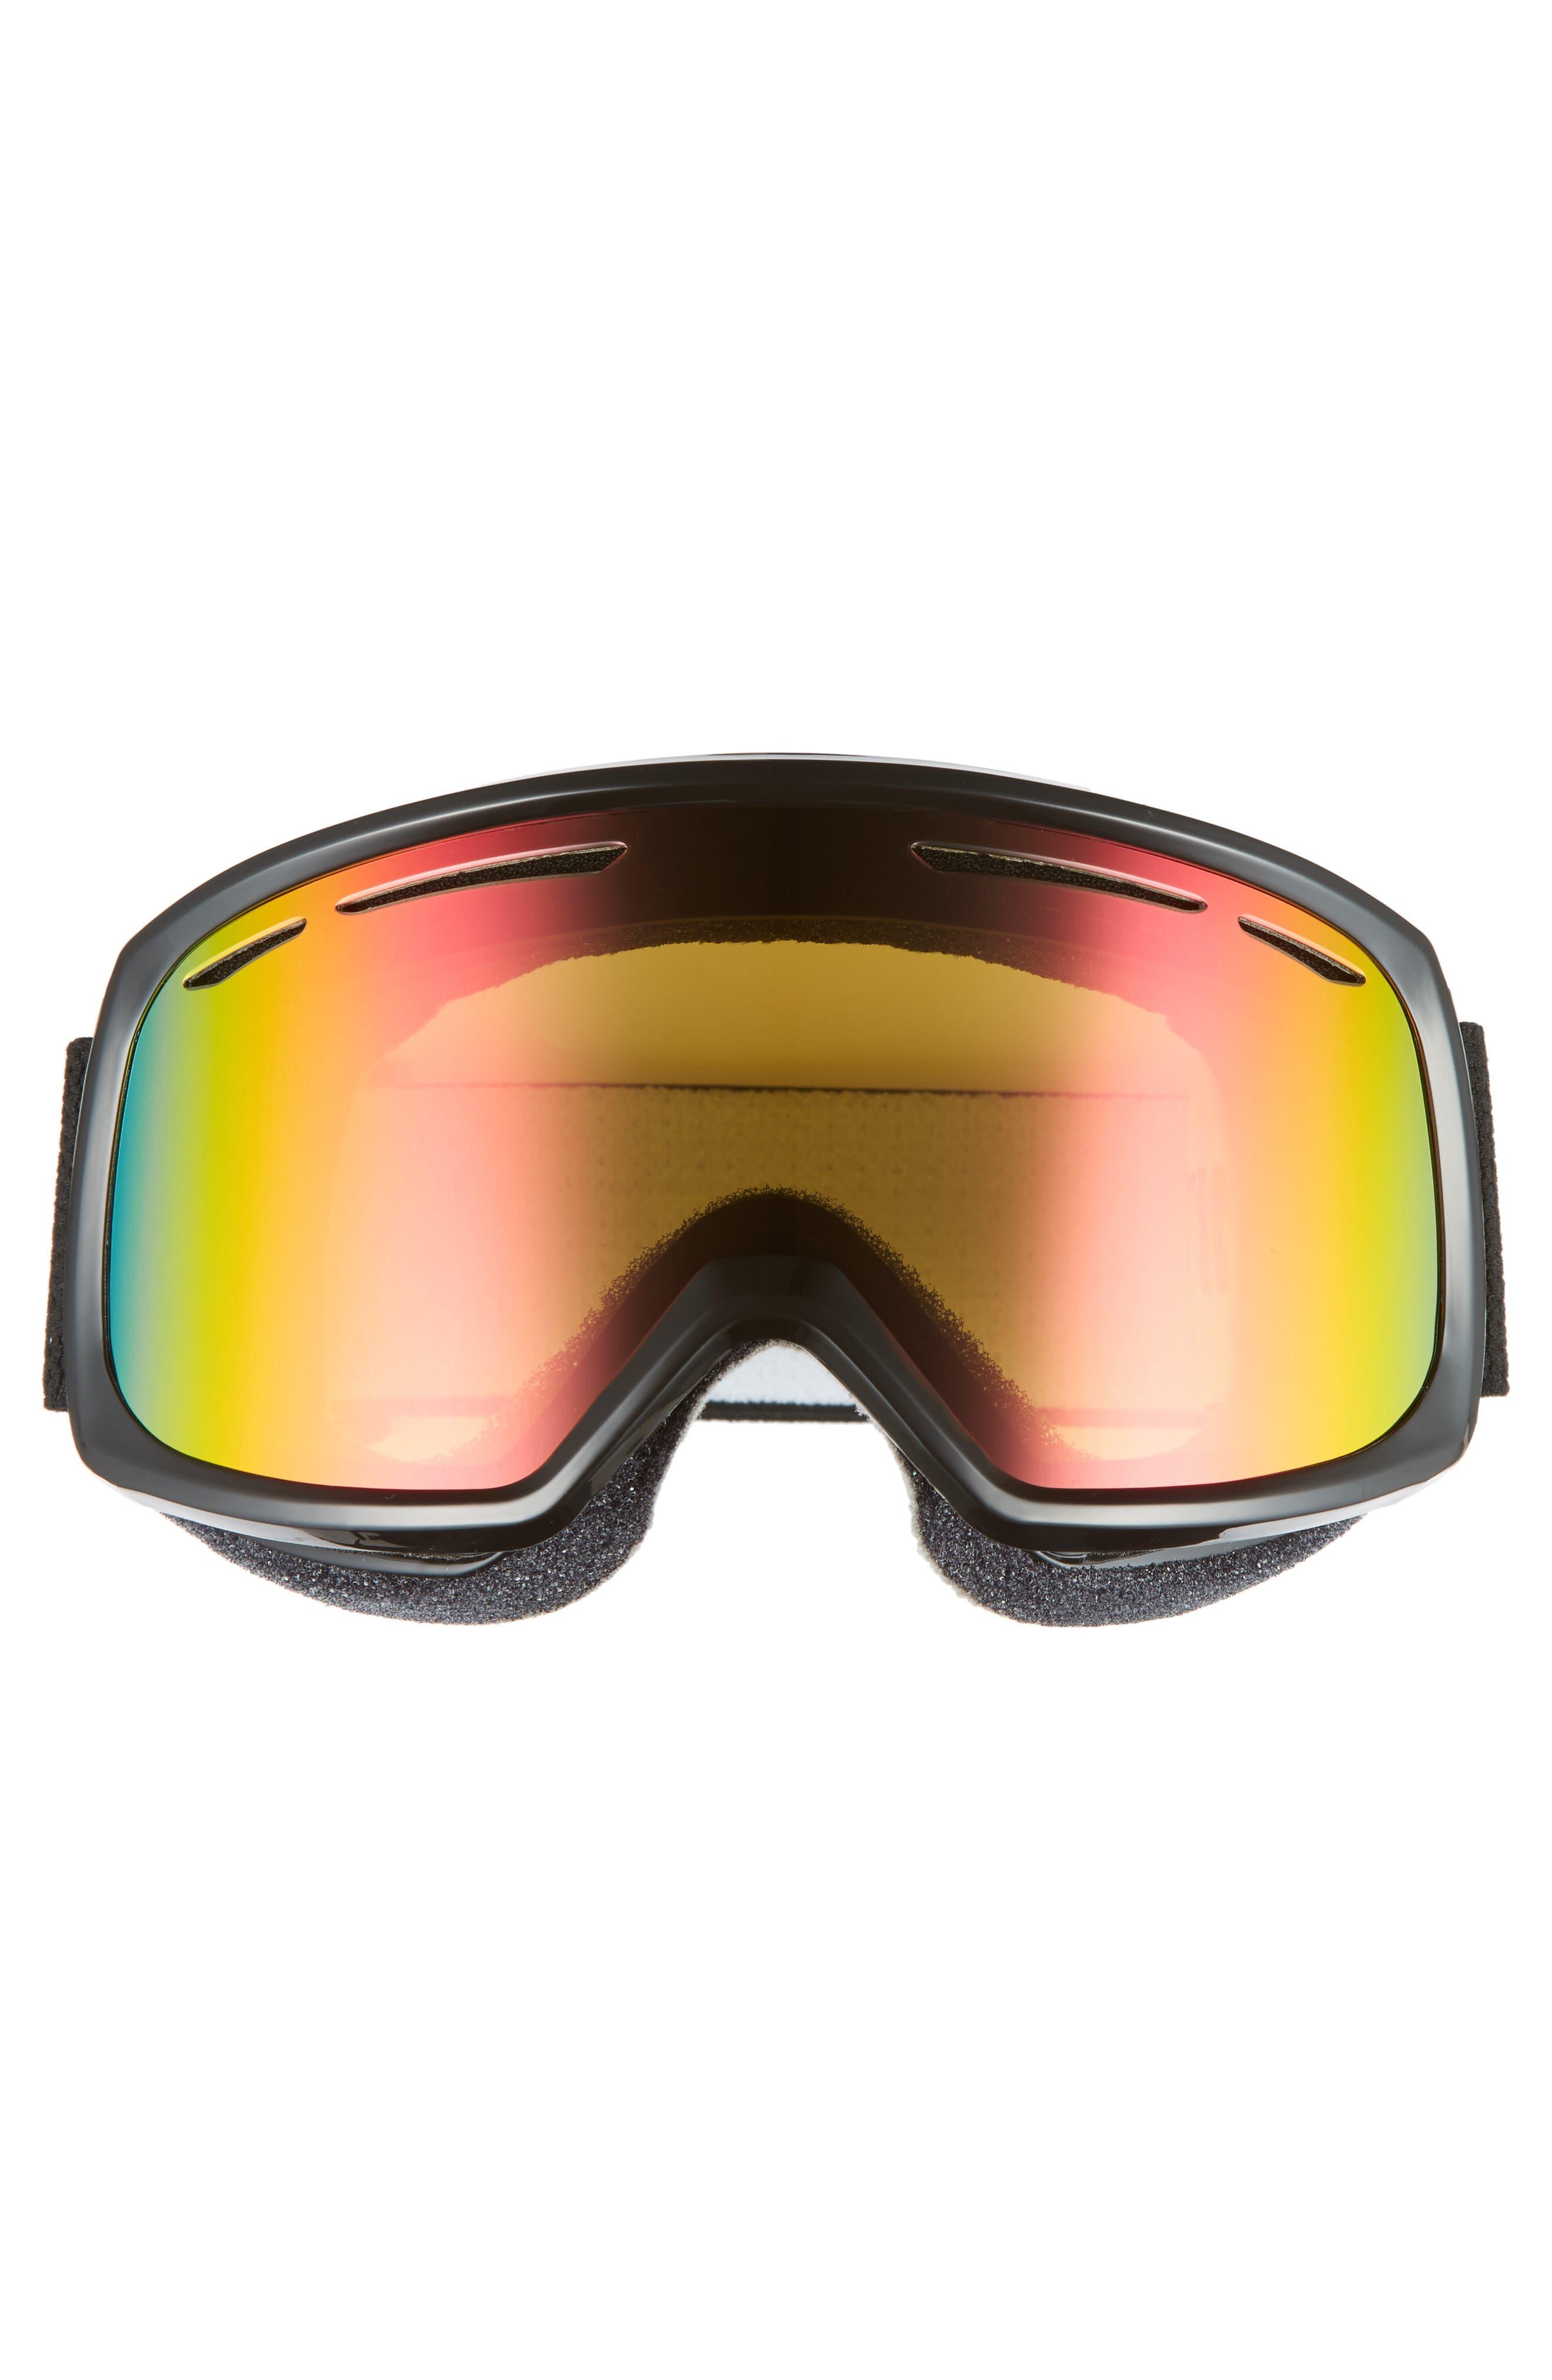 Drift Snow Goggles,                             Alternate thumbnail 3, color,                             BLACK/ MIRROR